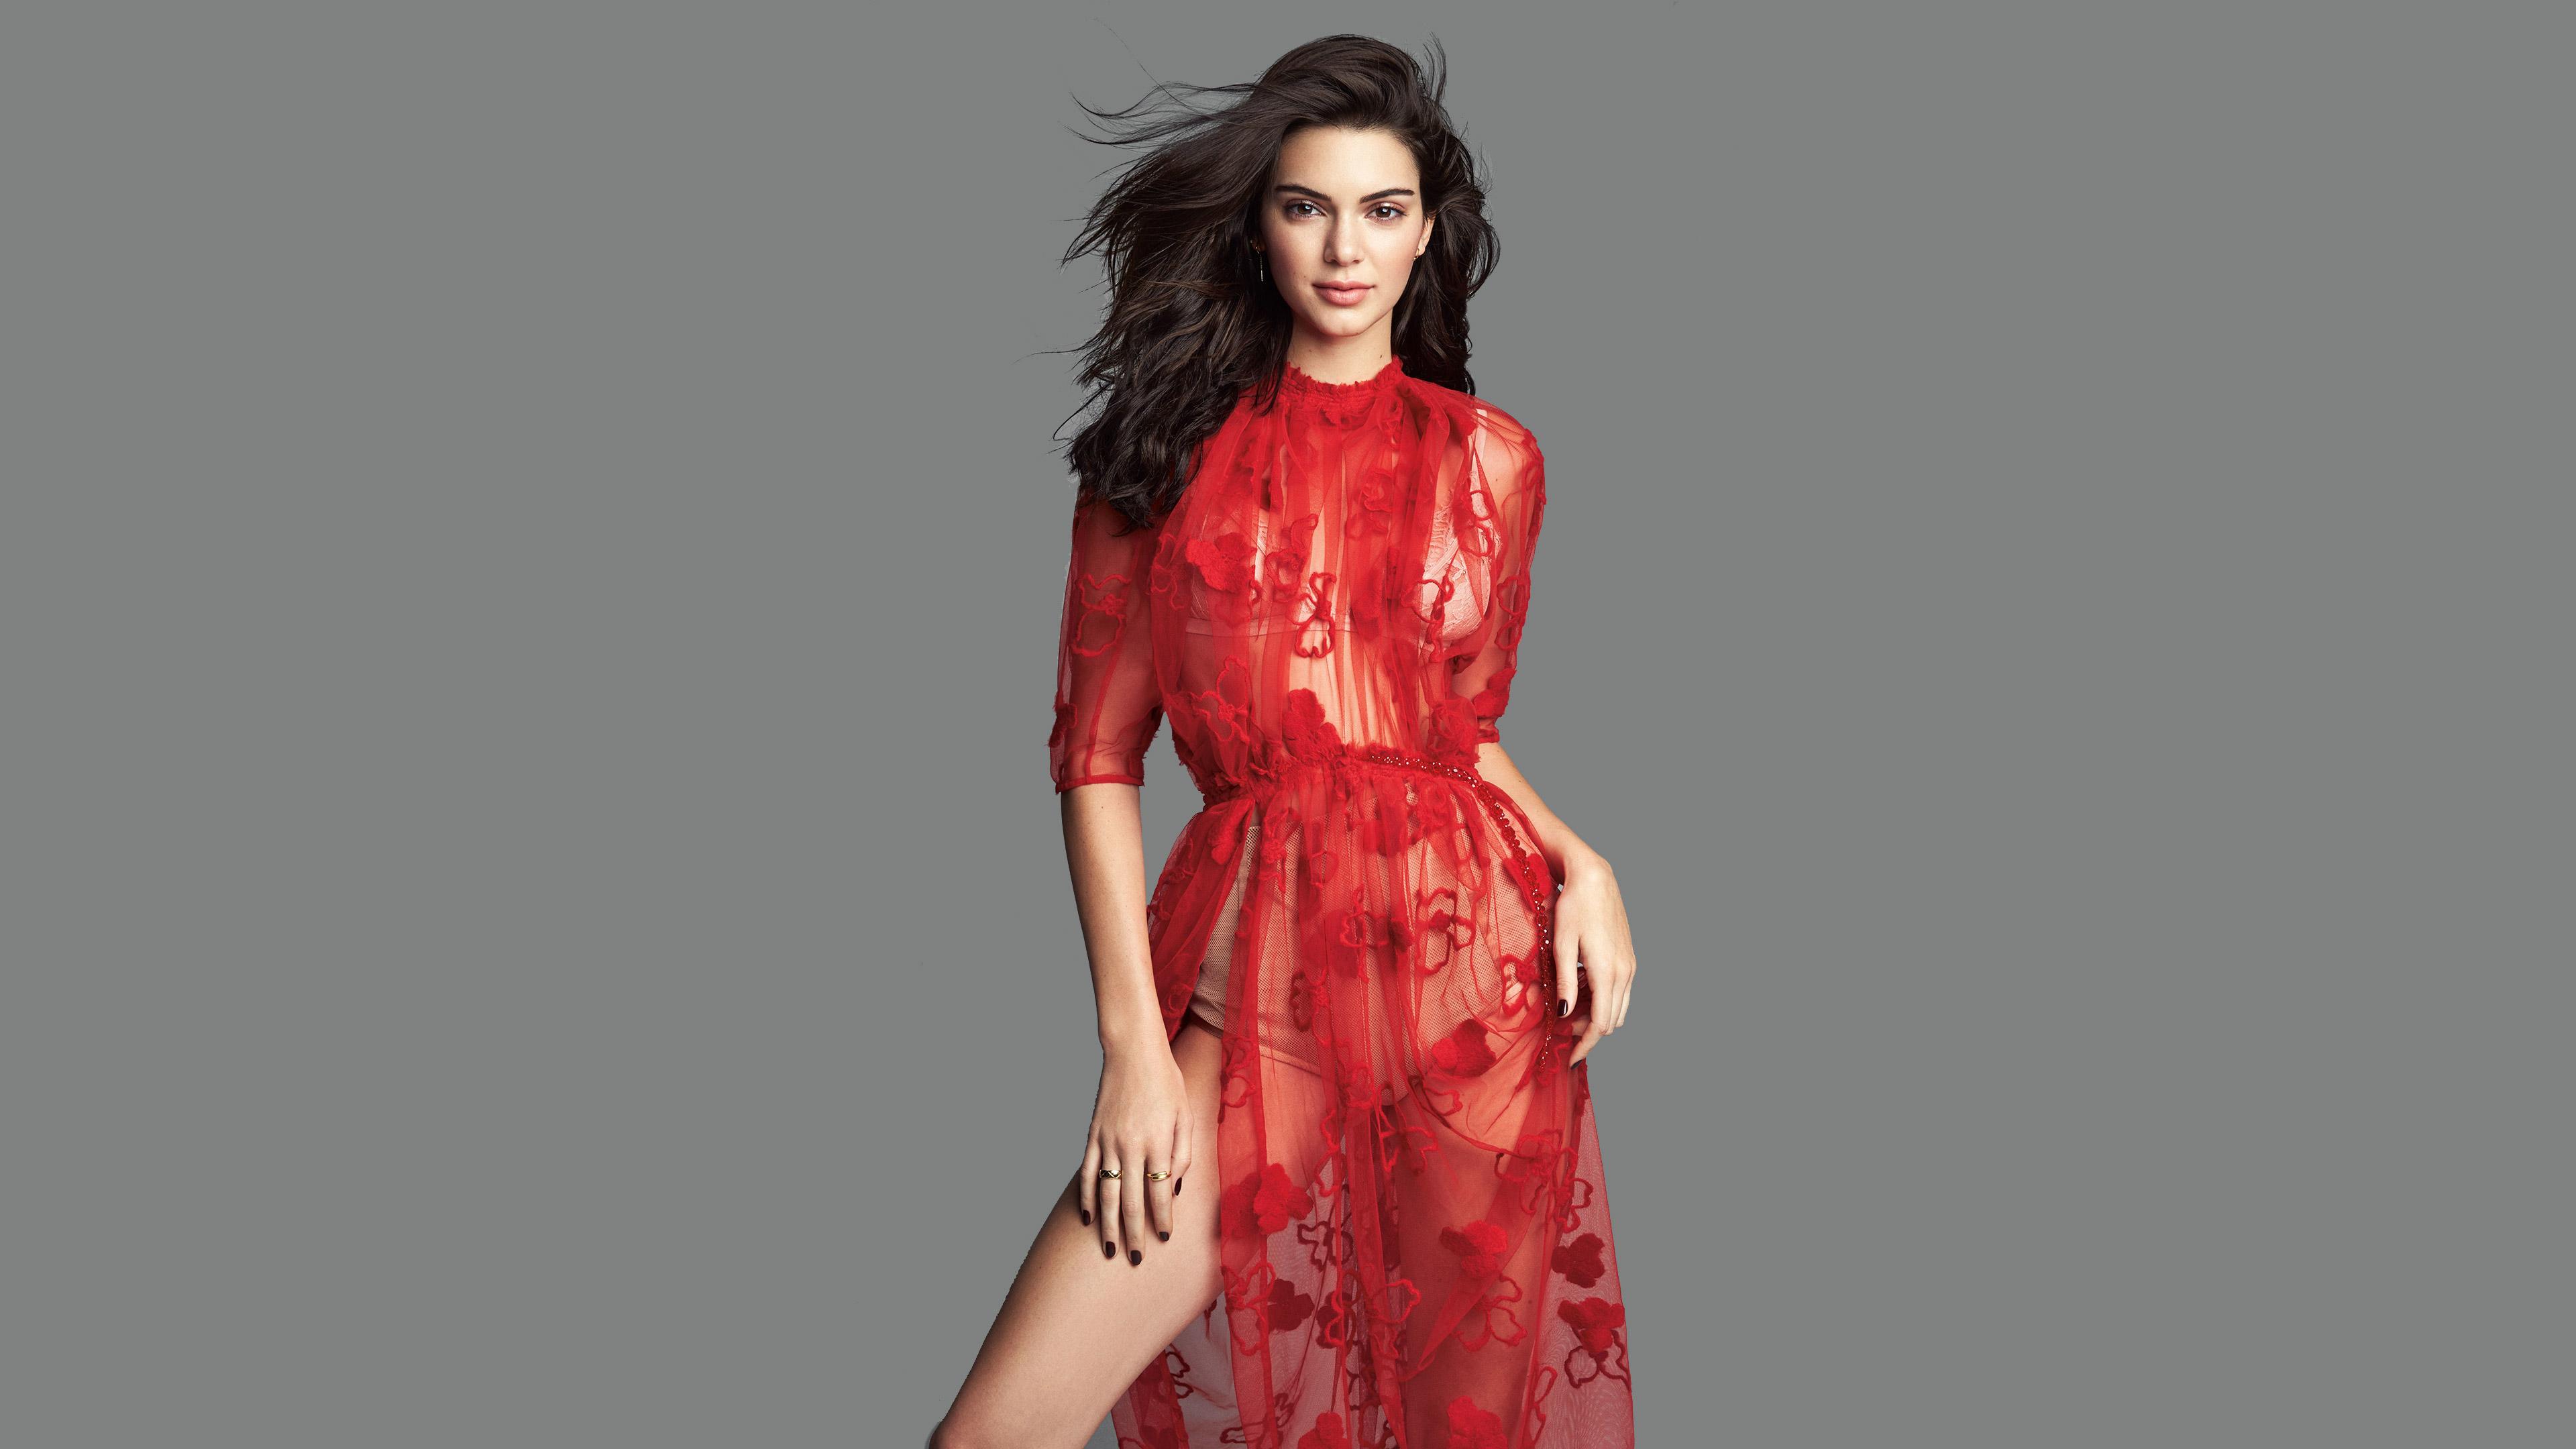 kendall jenner allure 2016 1536857465 - Kendall Jenner Allure 2016 - kendall jenner wallpapers, girls wallpapers, celebrities wallpapers